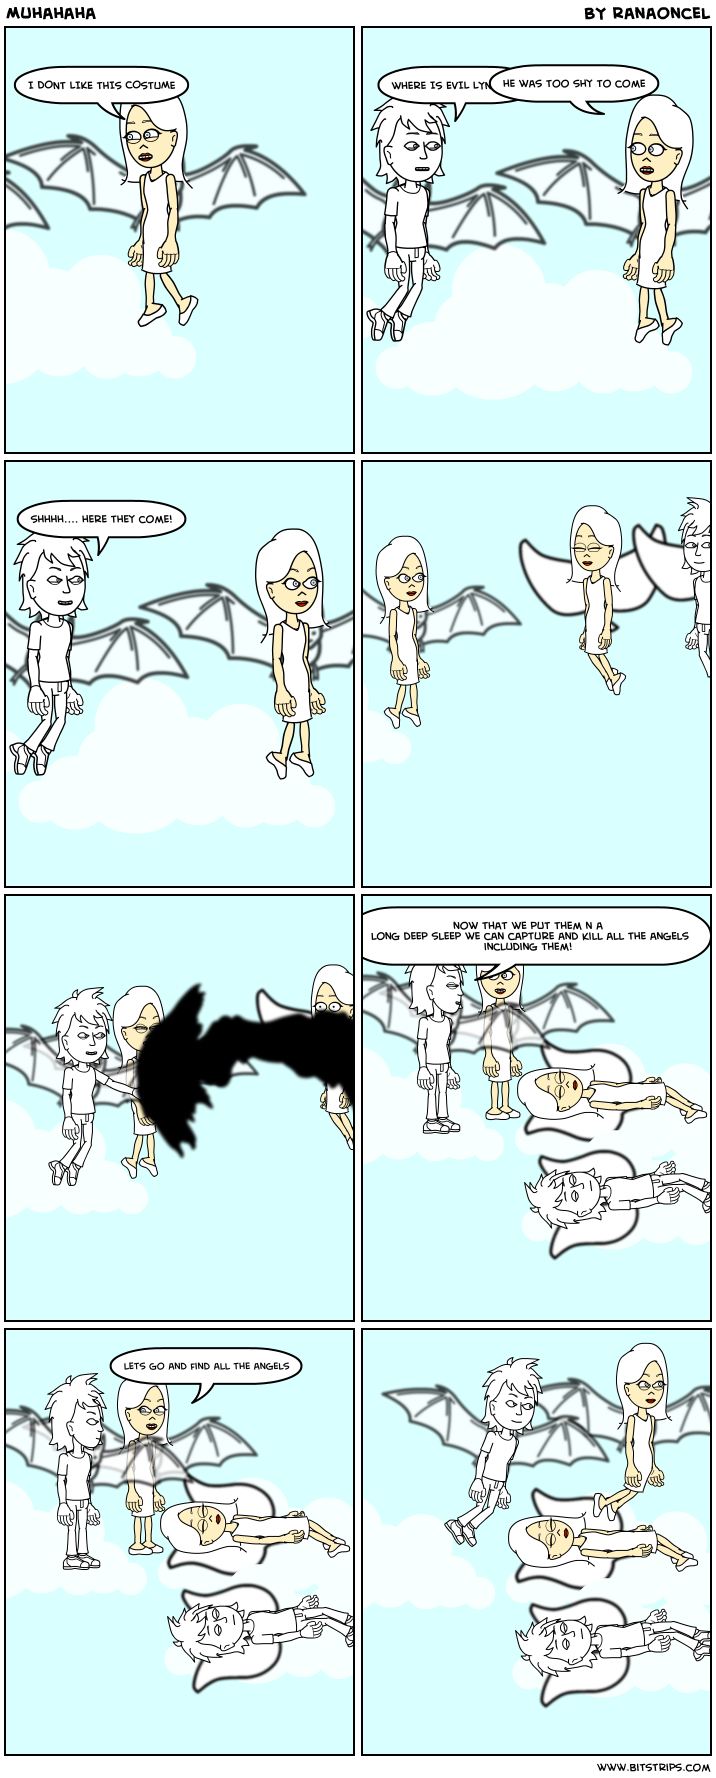 Muhahaha